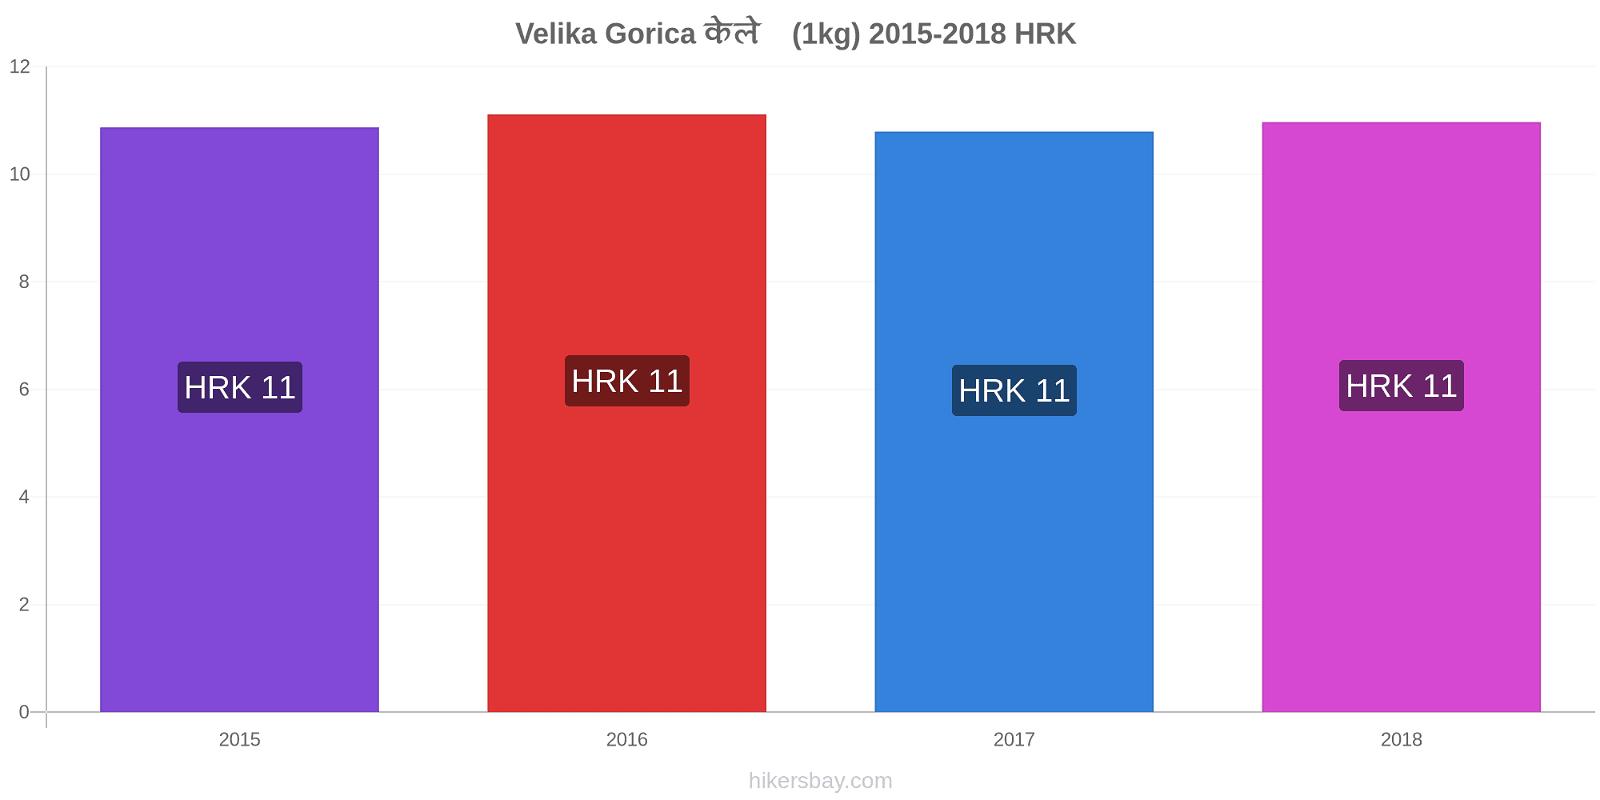 Velika Gorica मूल्य परिवर्तन केले (1kg) hikersbay.com